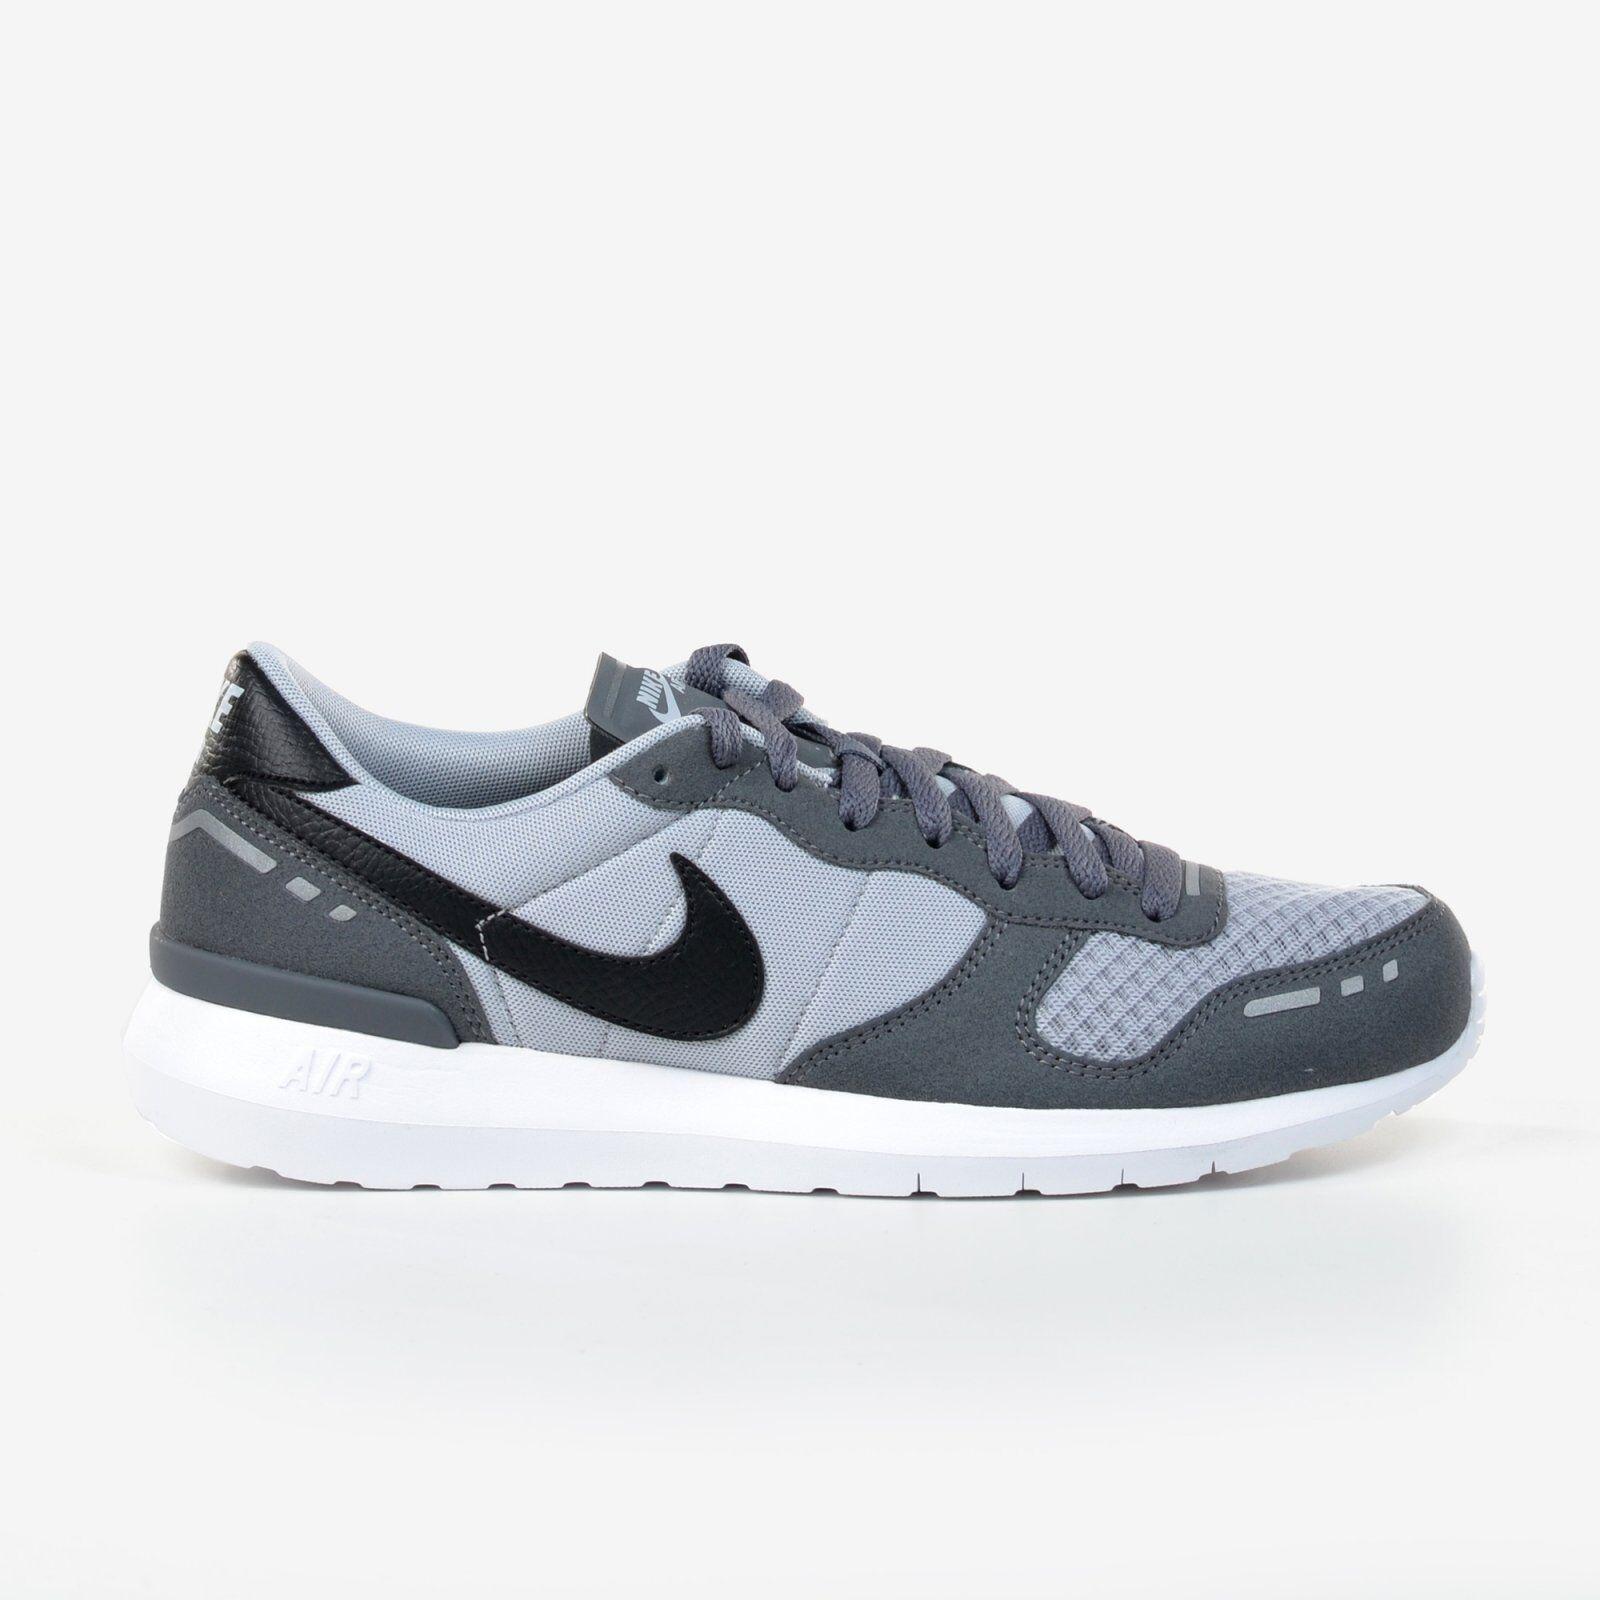 Seasonal price cuts, discount benefits Nike Air Vrtx '17 Vortex Wolf Grey Black 2017 Men's Running Shoes DS 876135-002